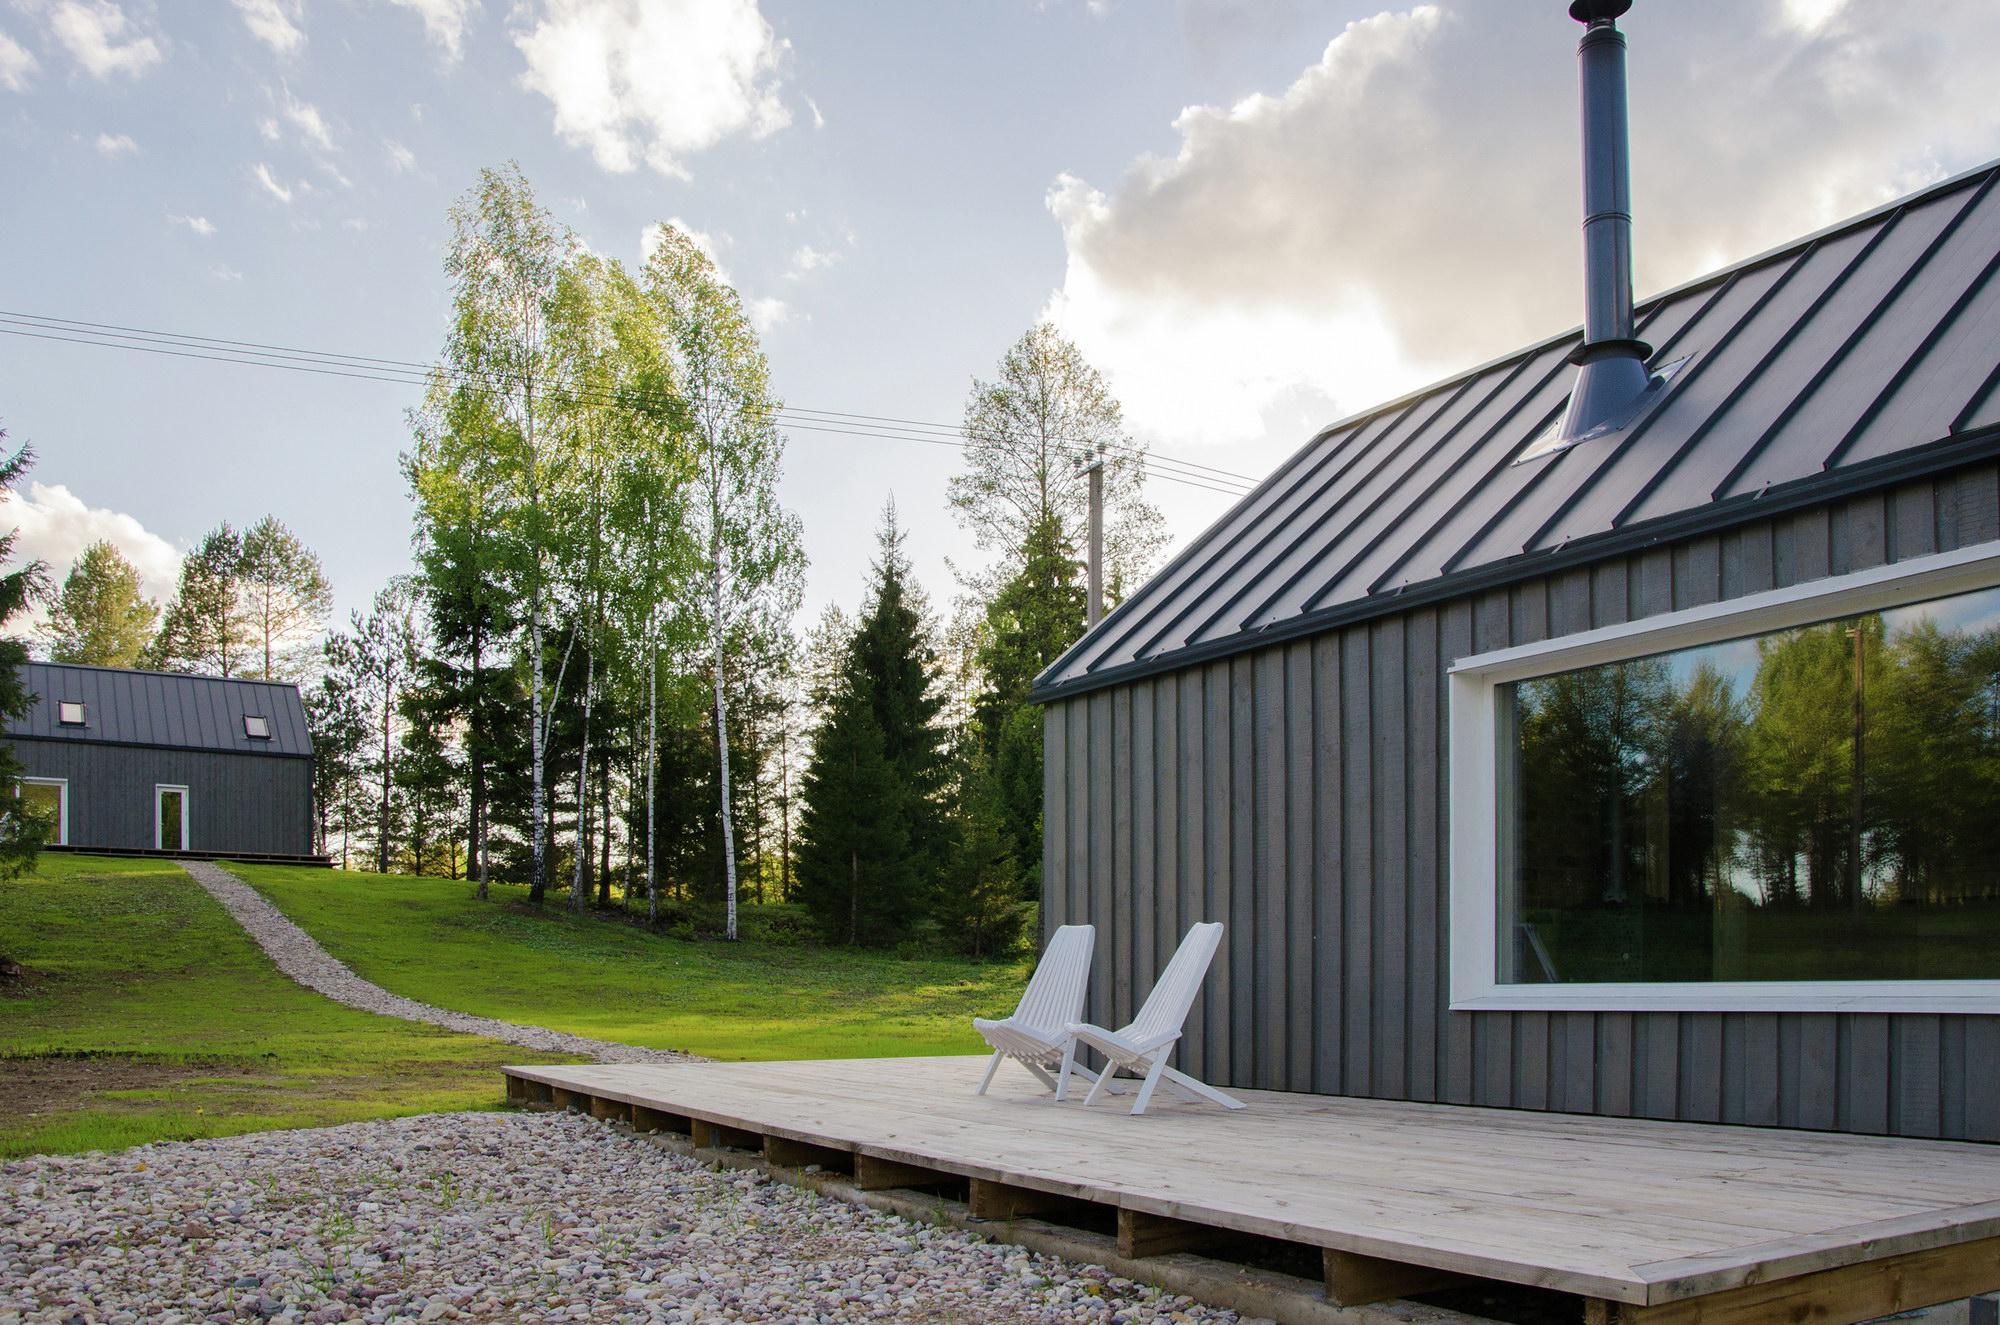 Lithuanian Hunting House by Devyni architektai